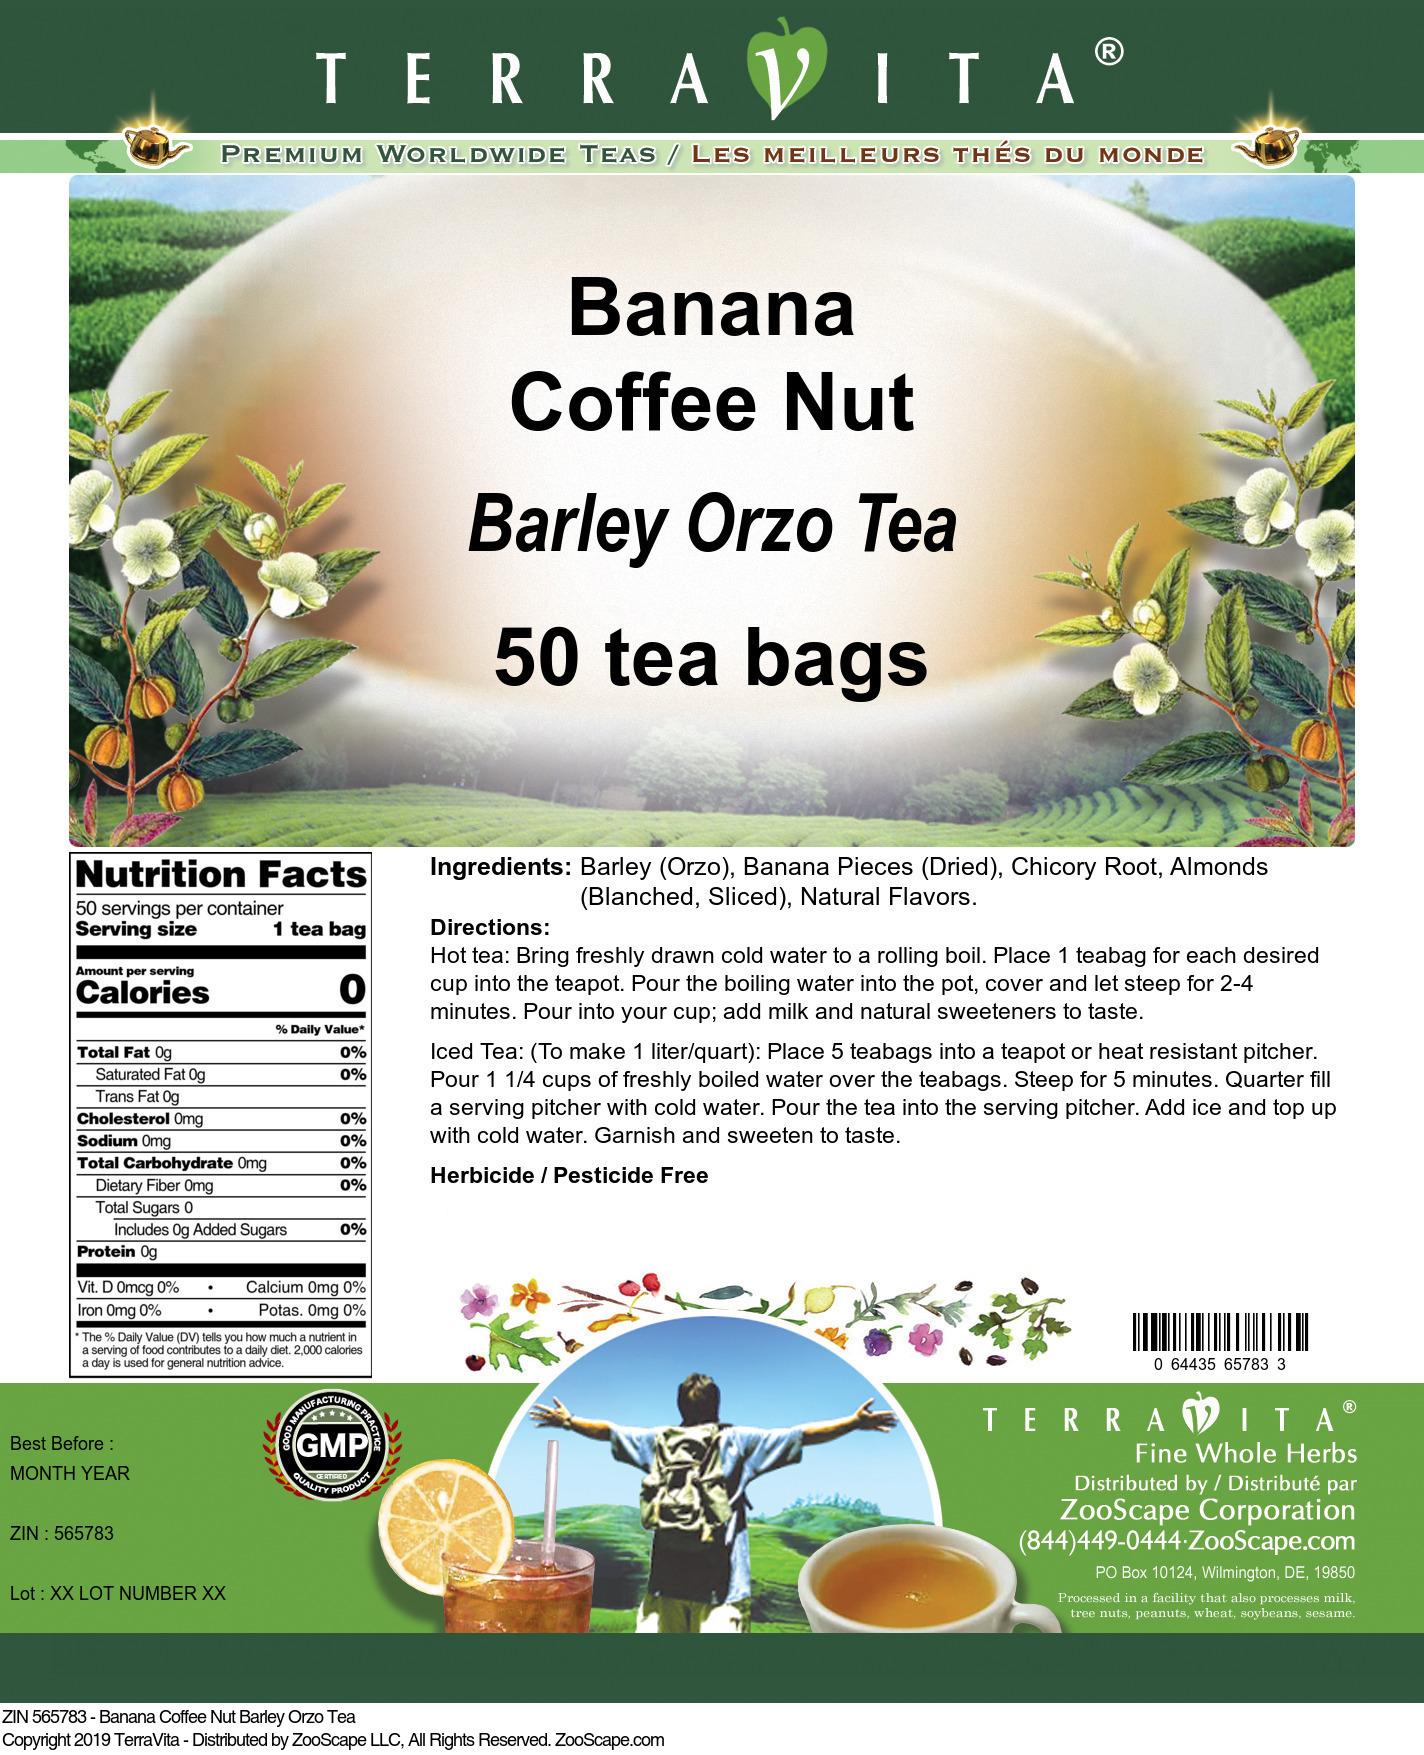 Banana Coffee Nut Barley Orzo Tea